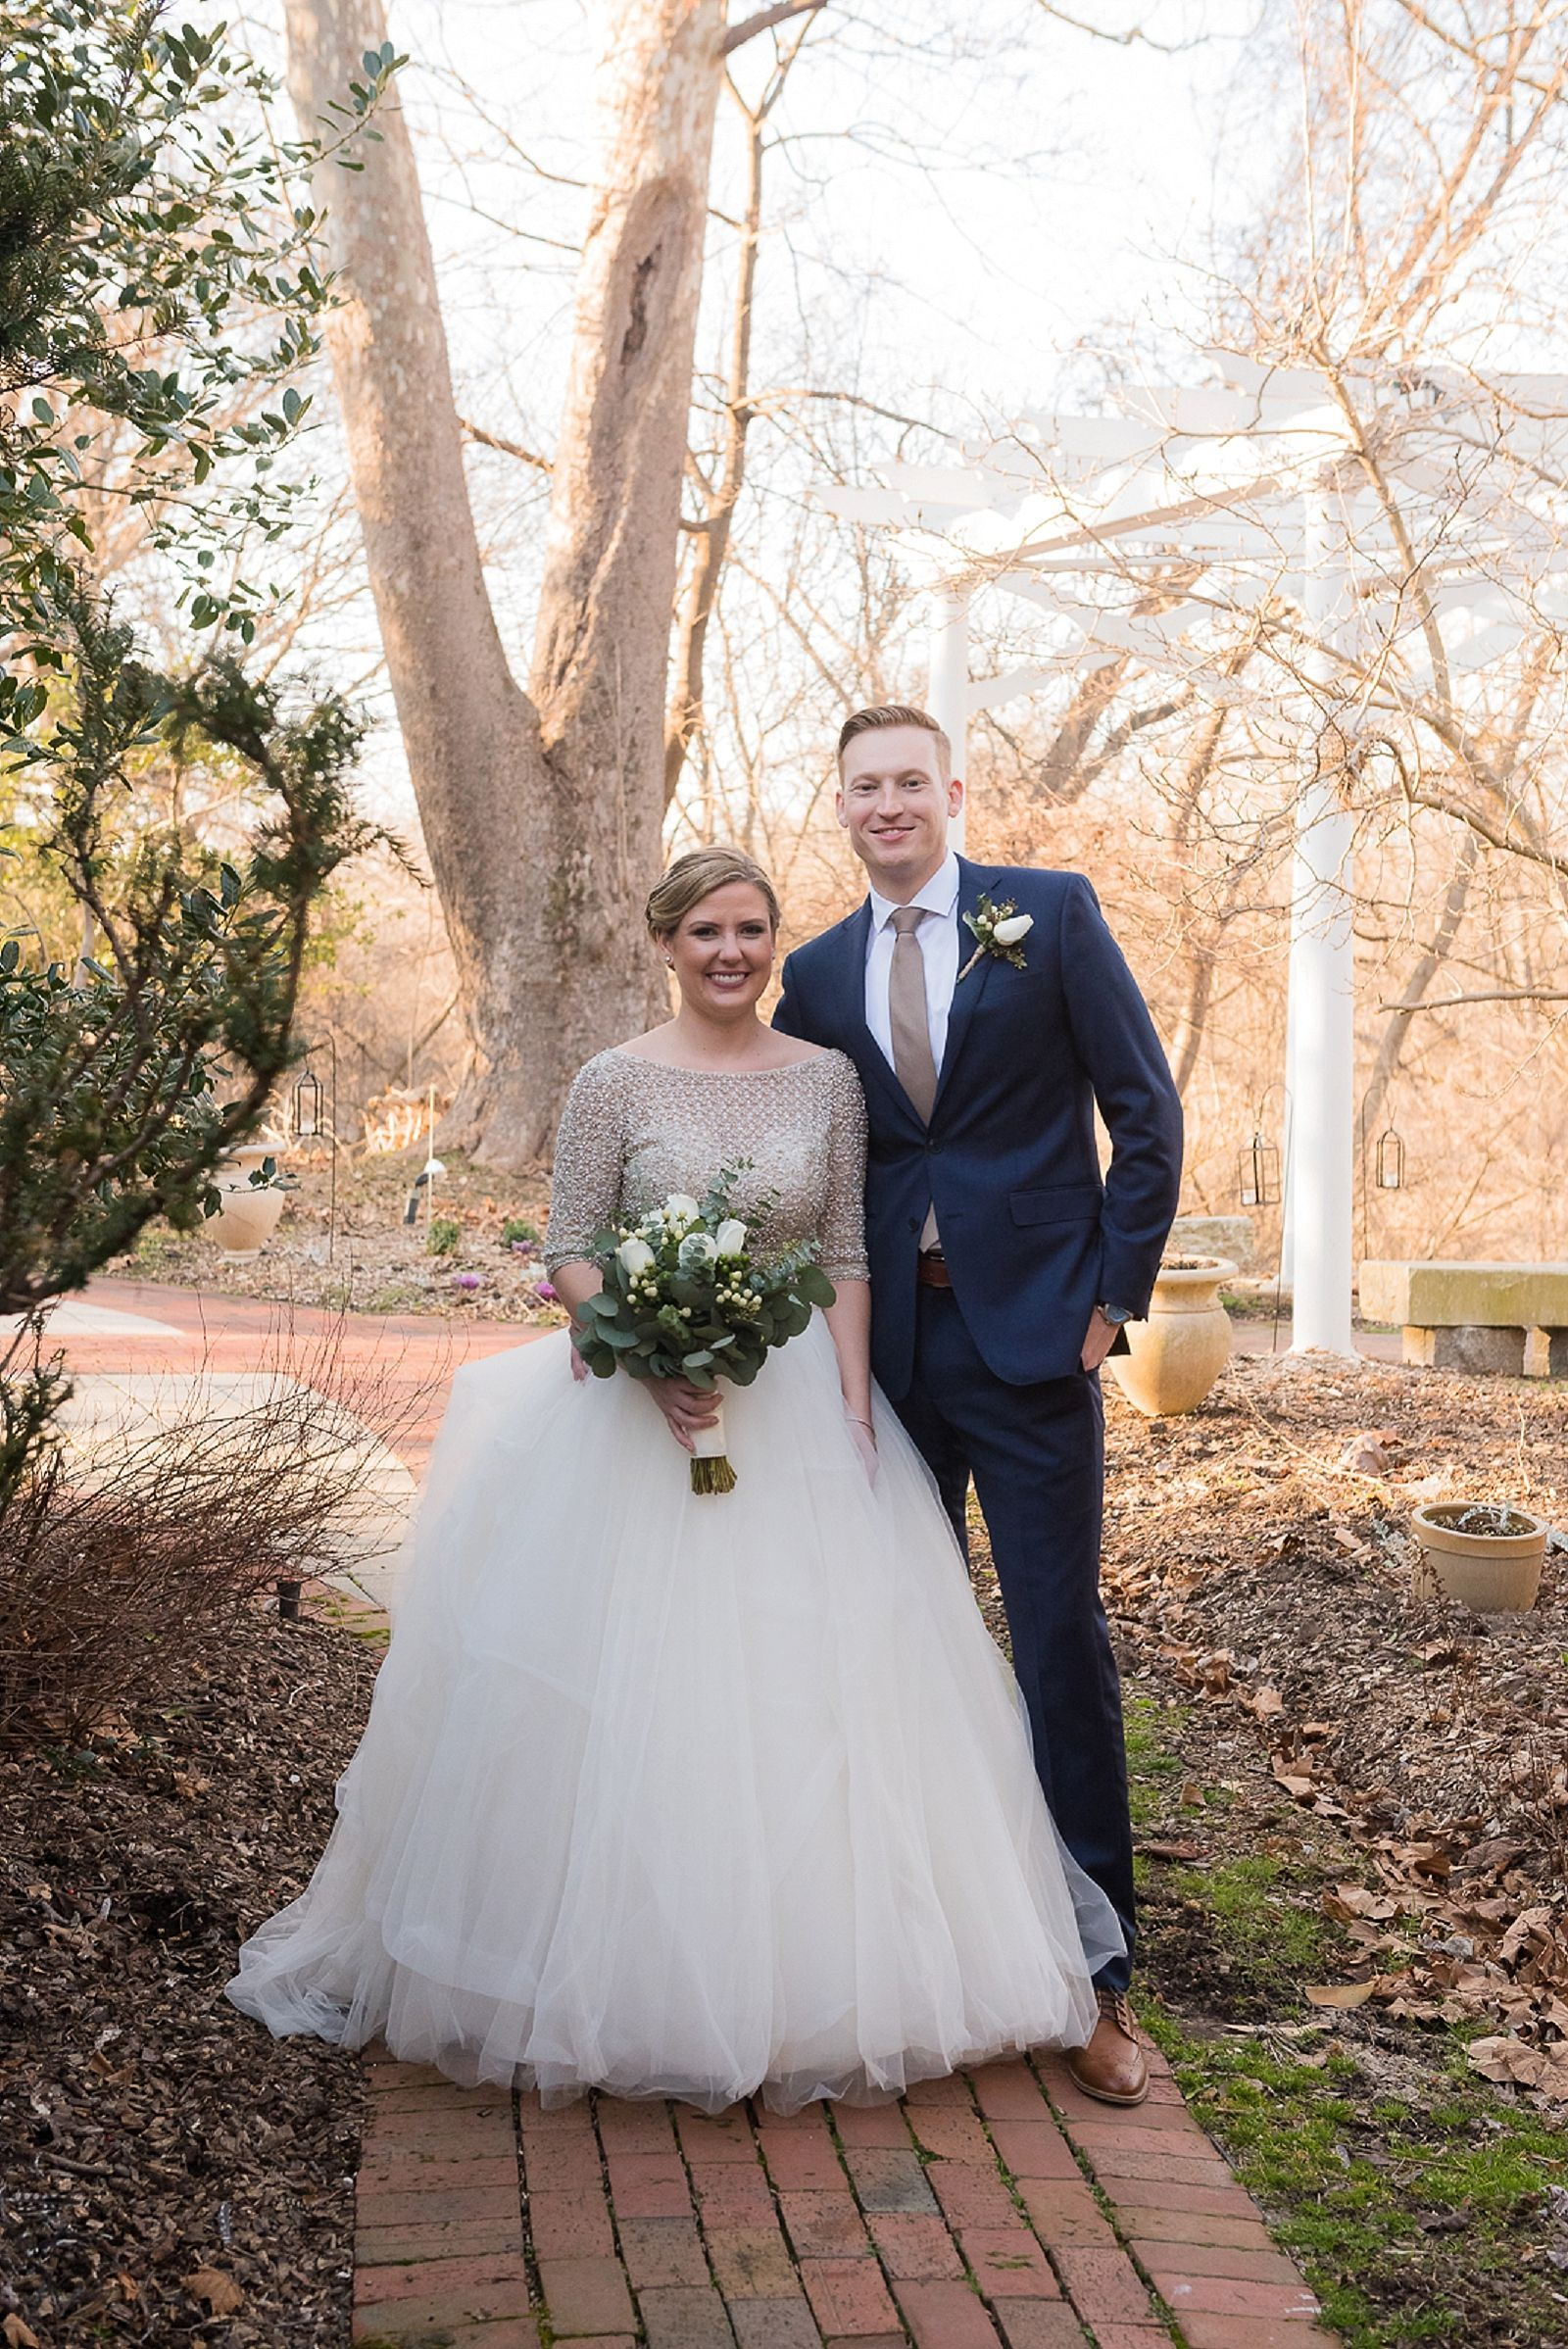 Warm Winter Wedding At The Elkridge Furnace Inn In 2020 Baltimore Wedding Photographer Baltimore Wedding Winter Wedding